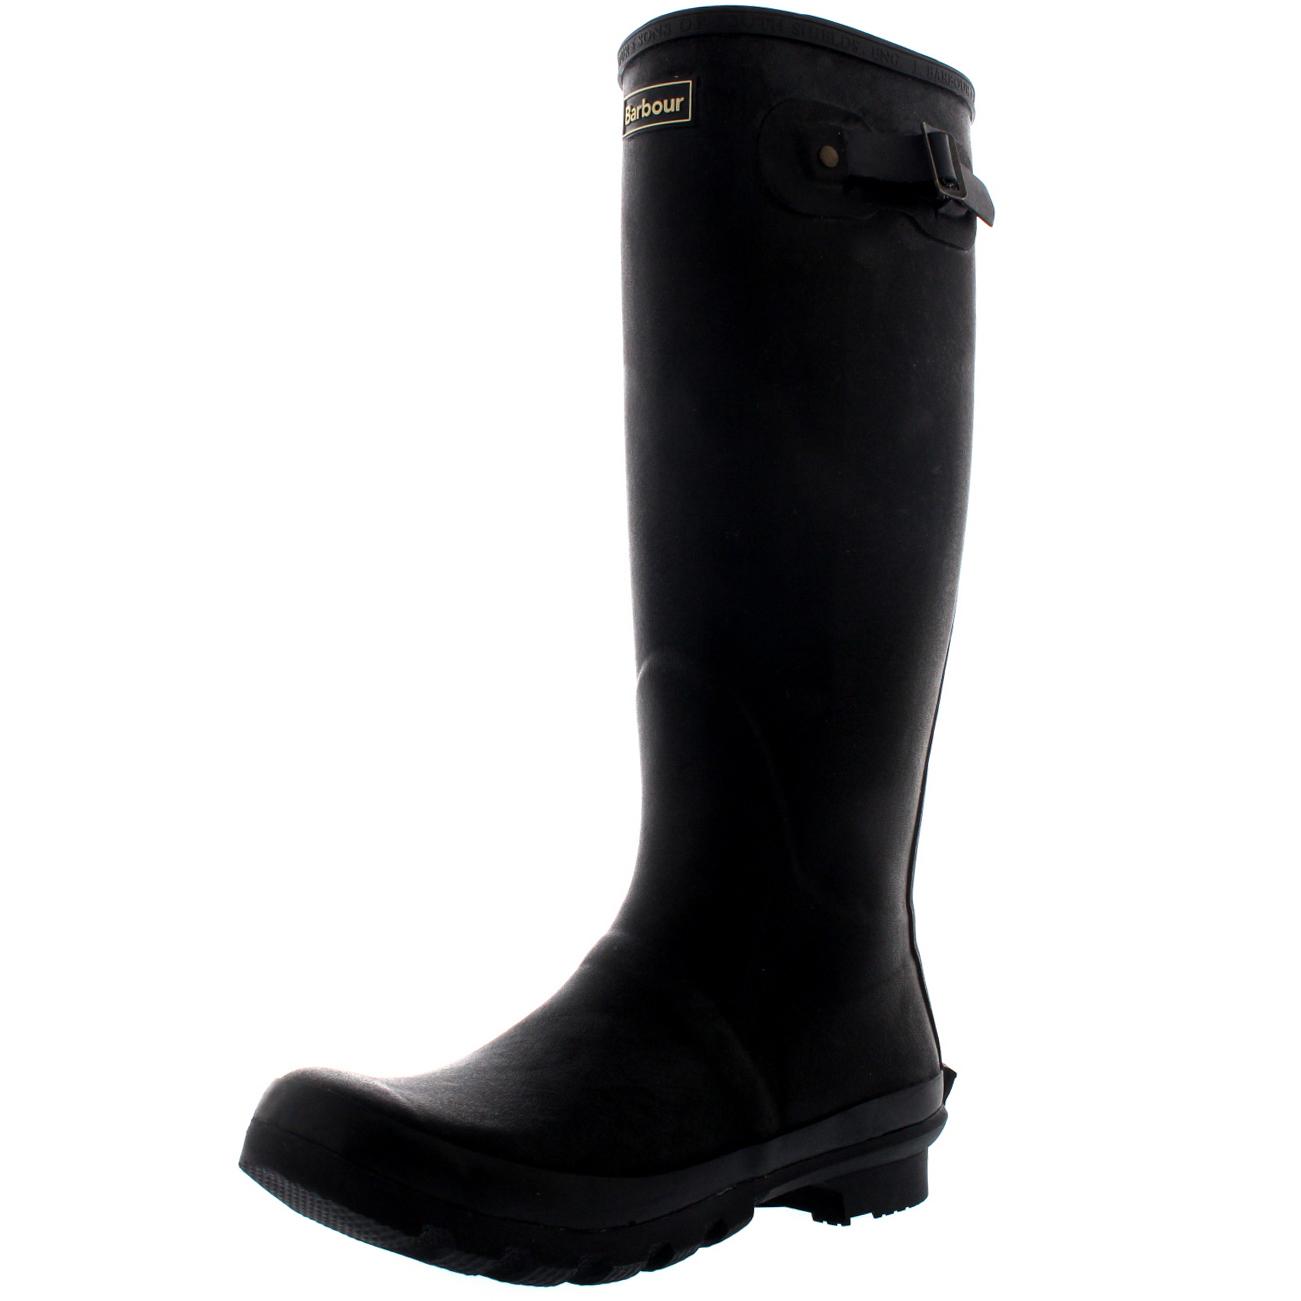 1b938b78 Mens Barbour Bede Winter Mid Calf Snow Waterproof Rain Wellington ...